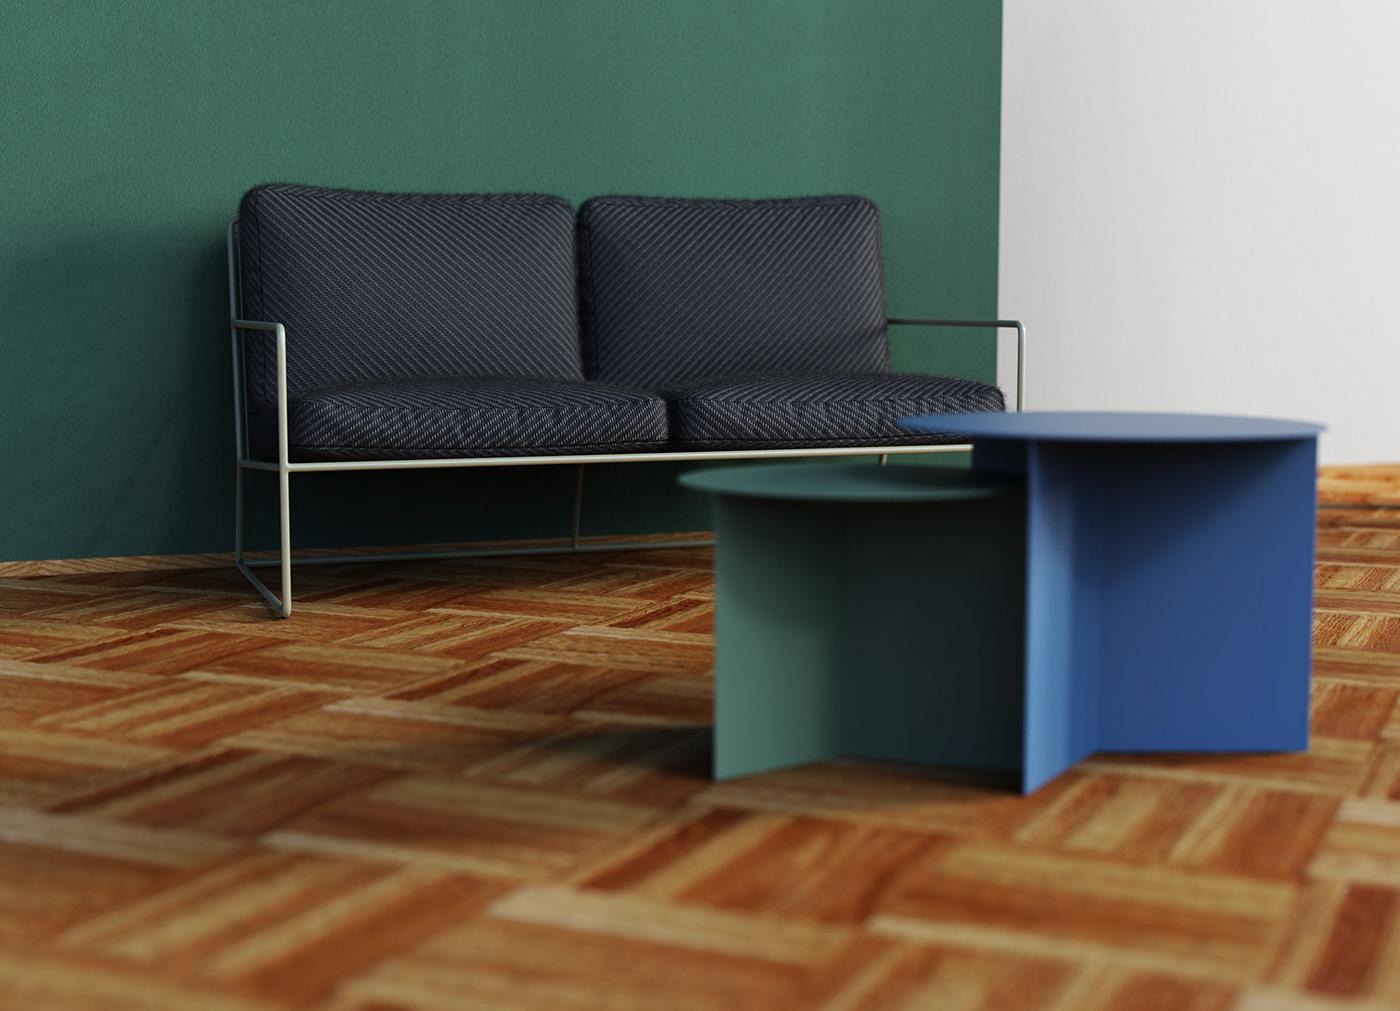 design furniture Interior interior design  keyshot Renderings Renders sofa visualisation